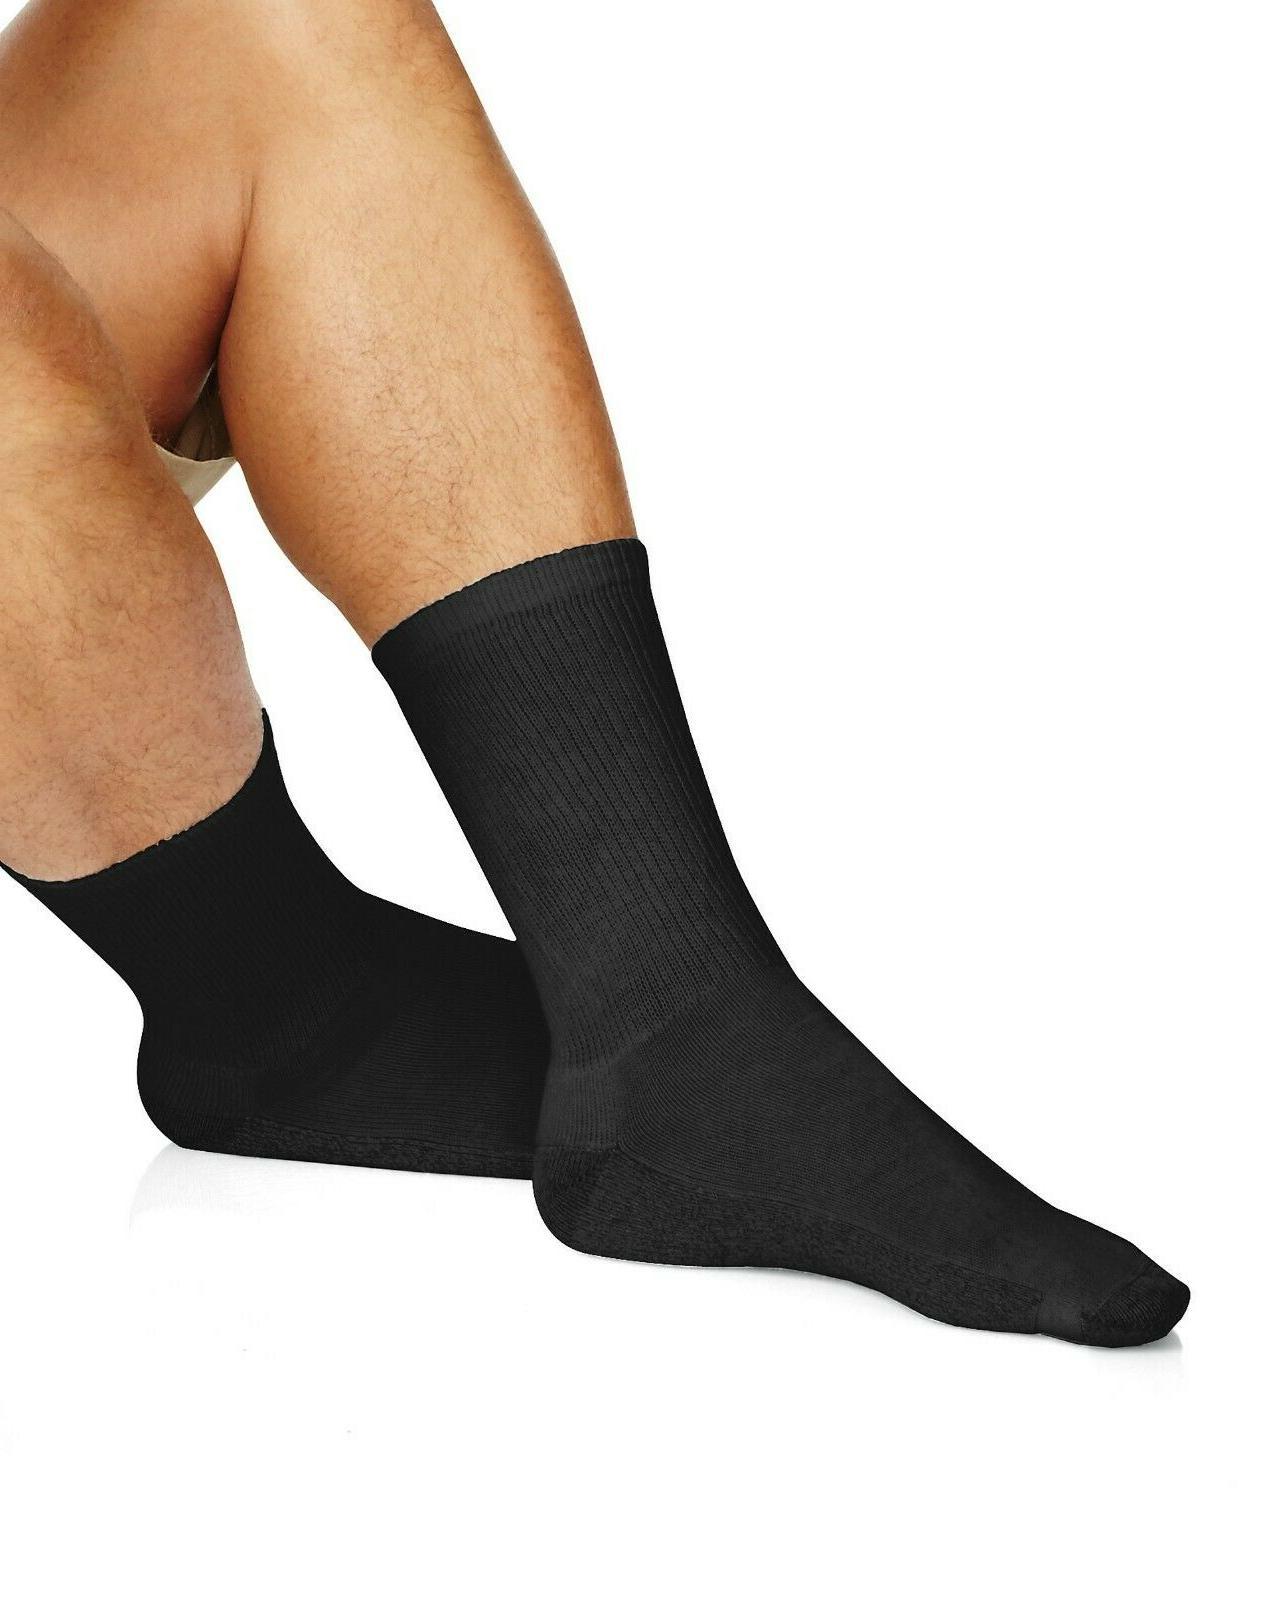 Socks White Socks Size:10-13/Shoe